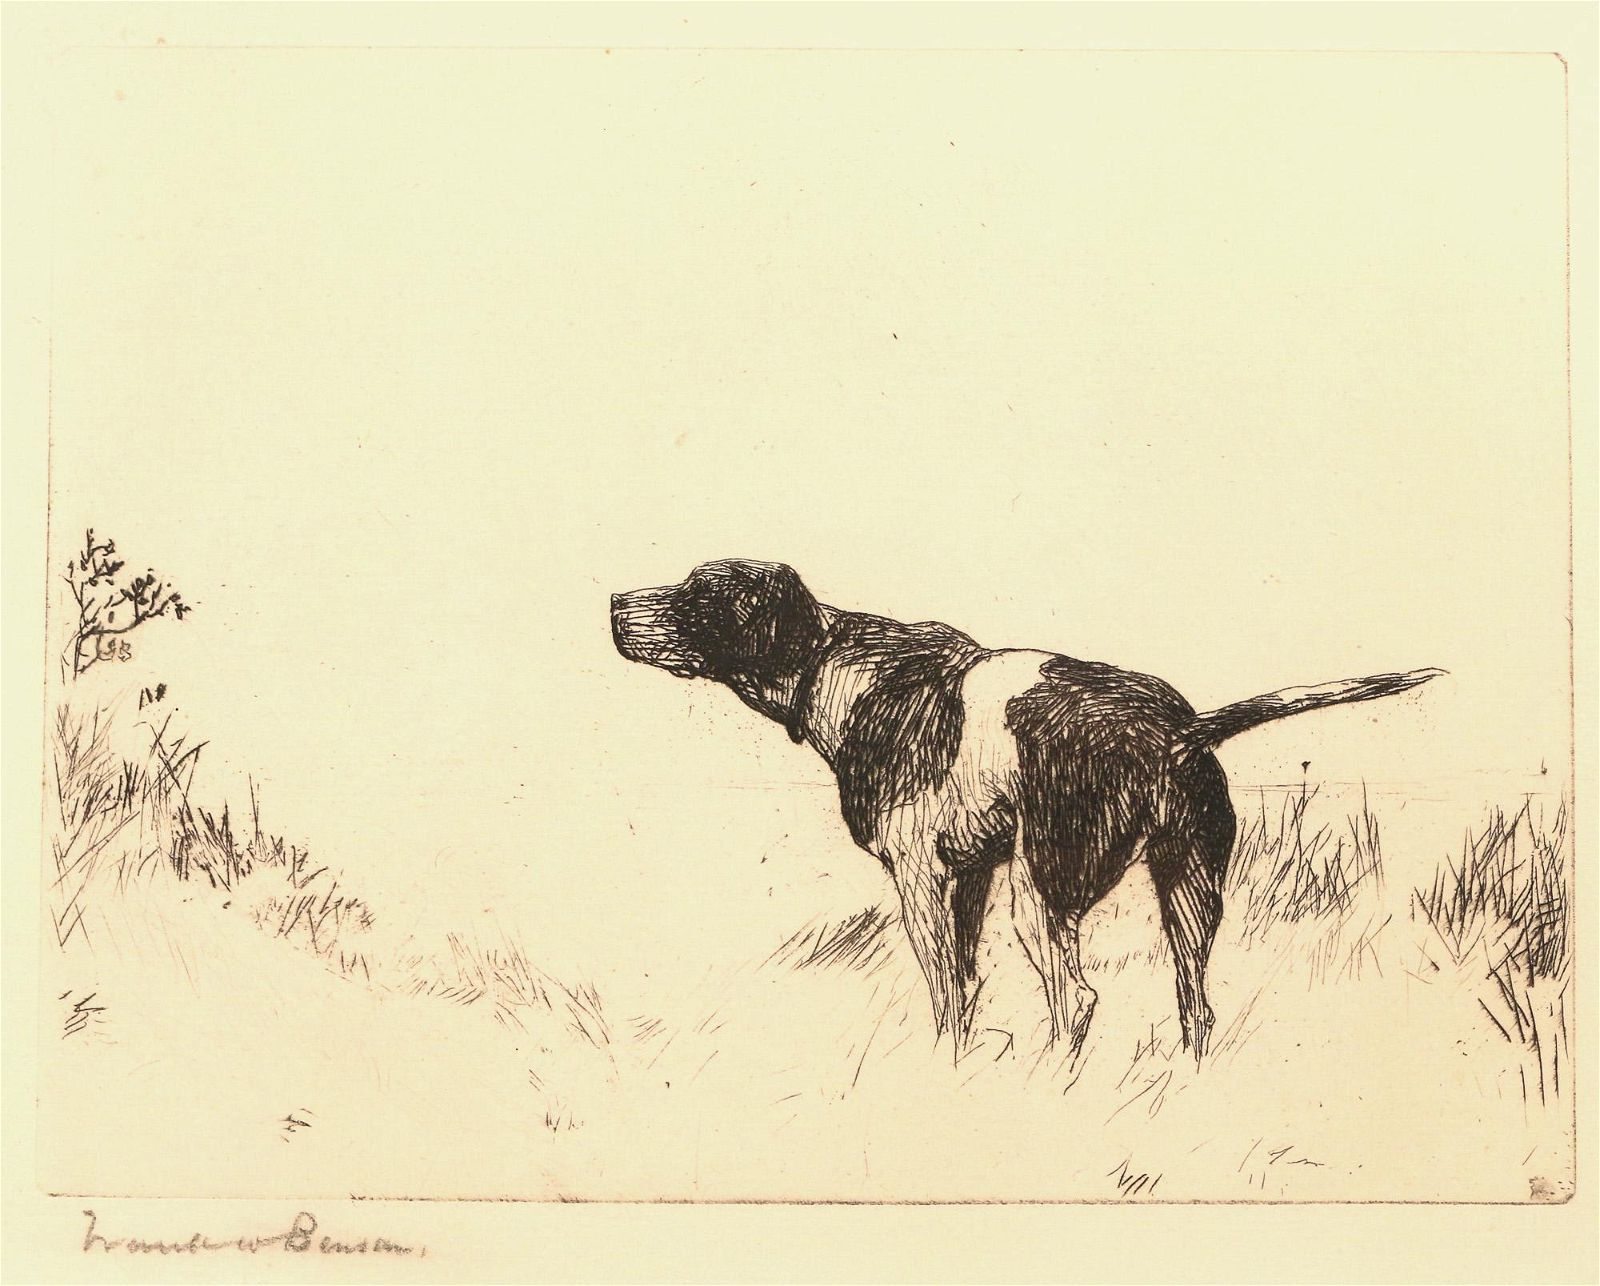 FRANK WESTON BENSON (American, 1862-1951), ETCHING